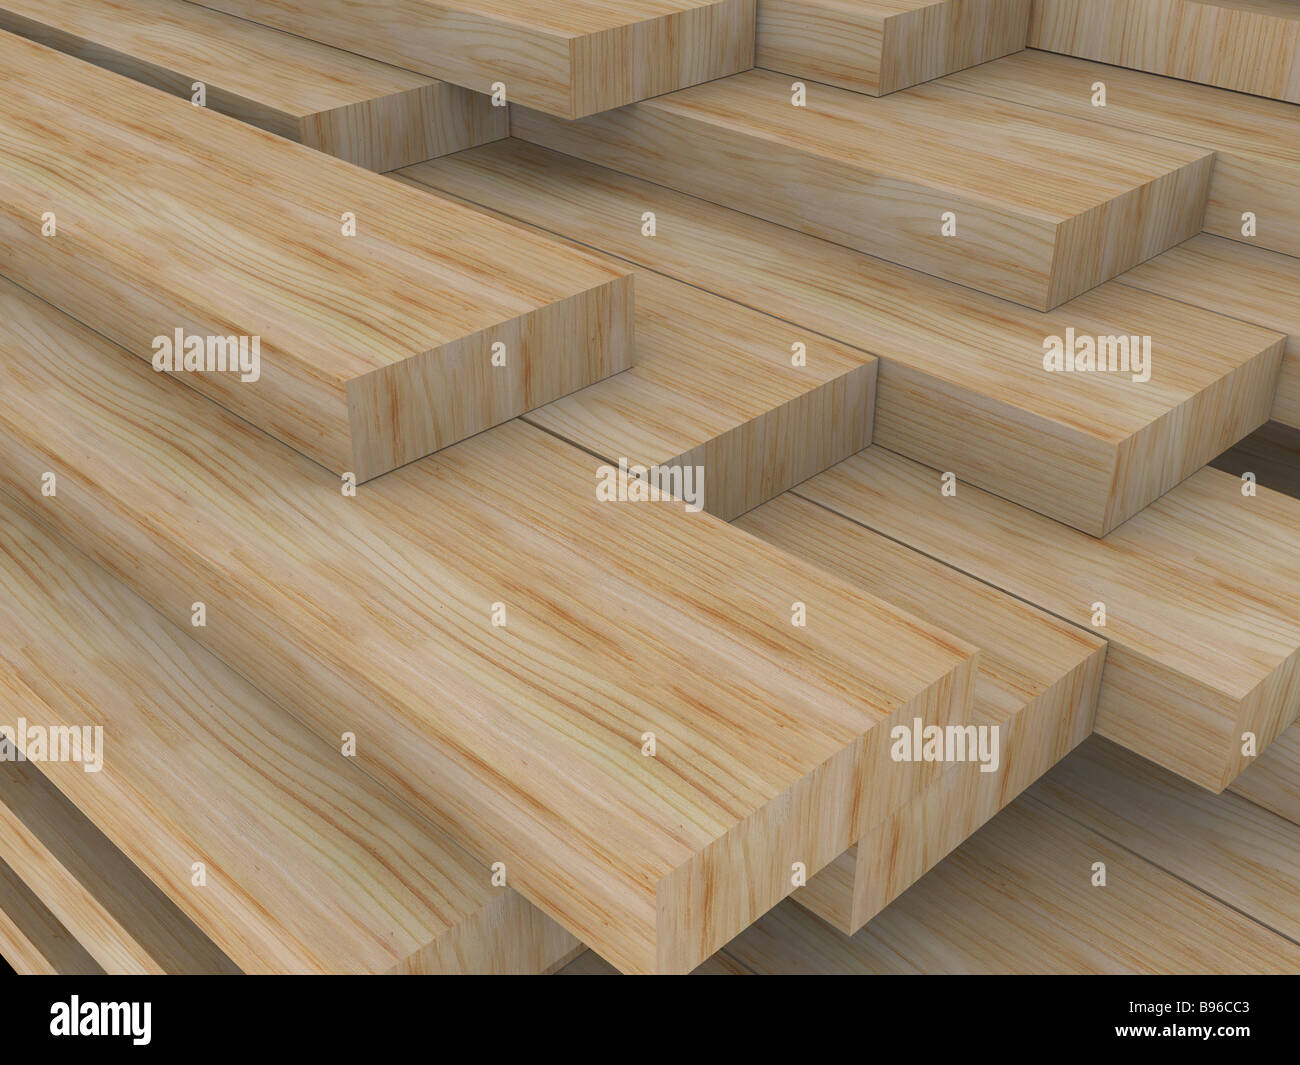 tableros de madera Imagen De Stock